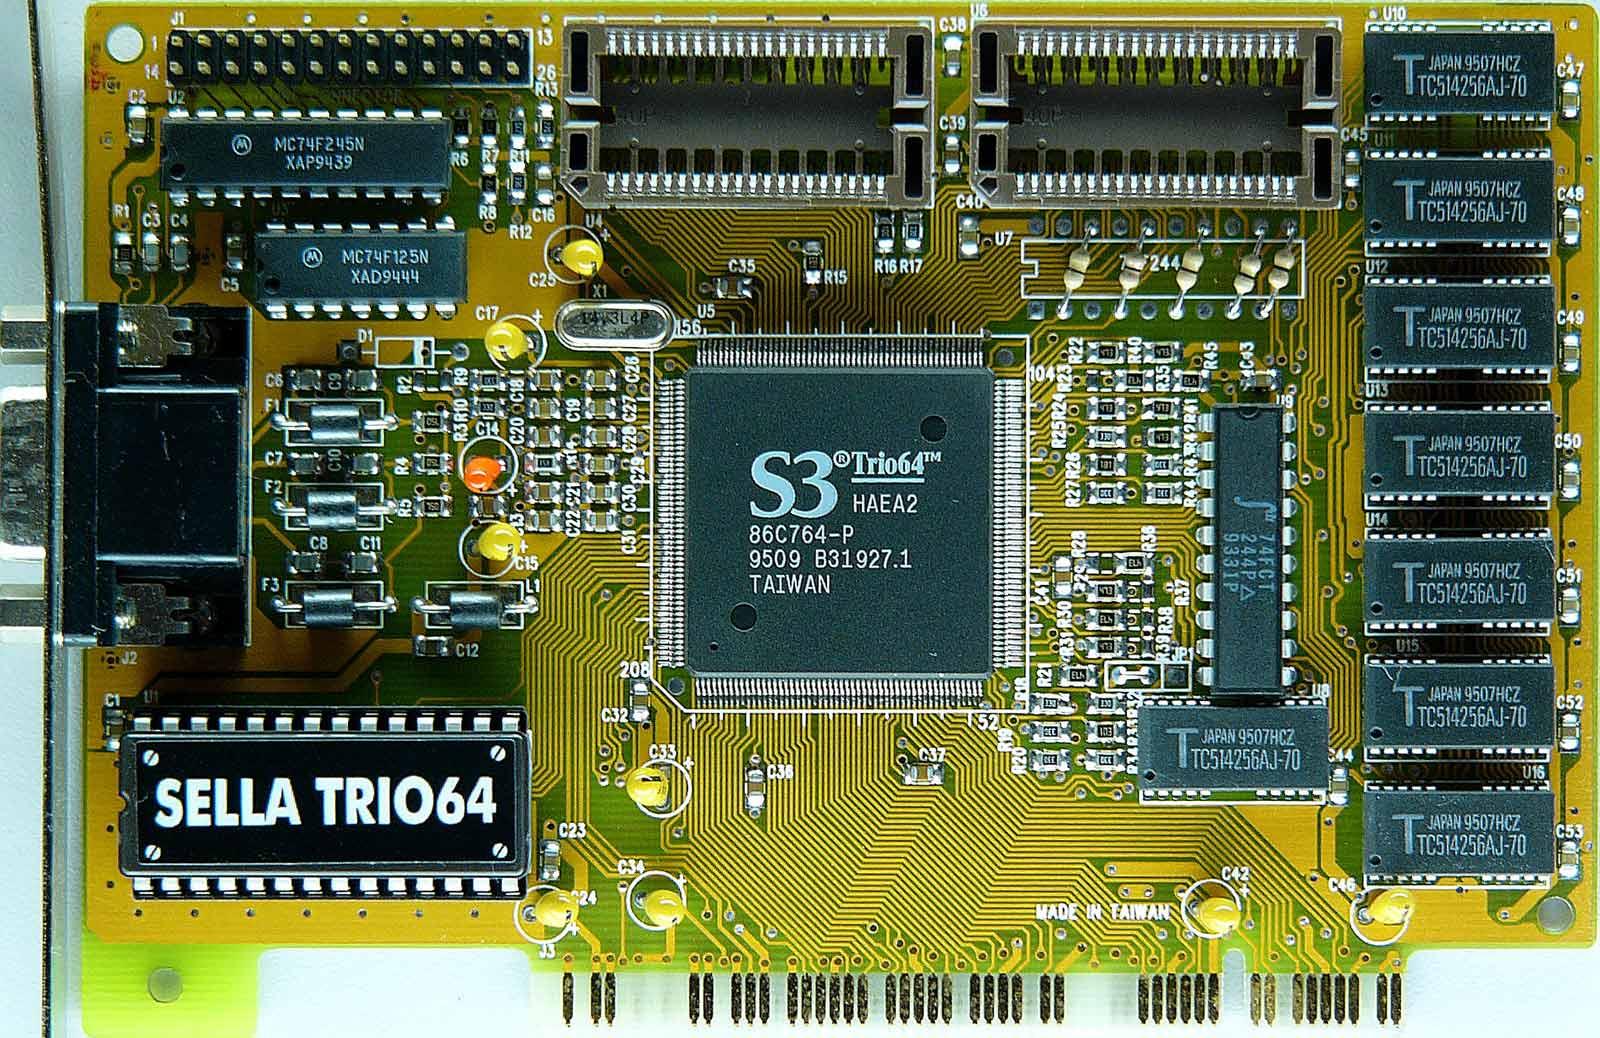 S3 Trio64